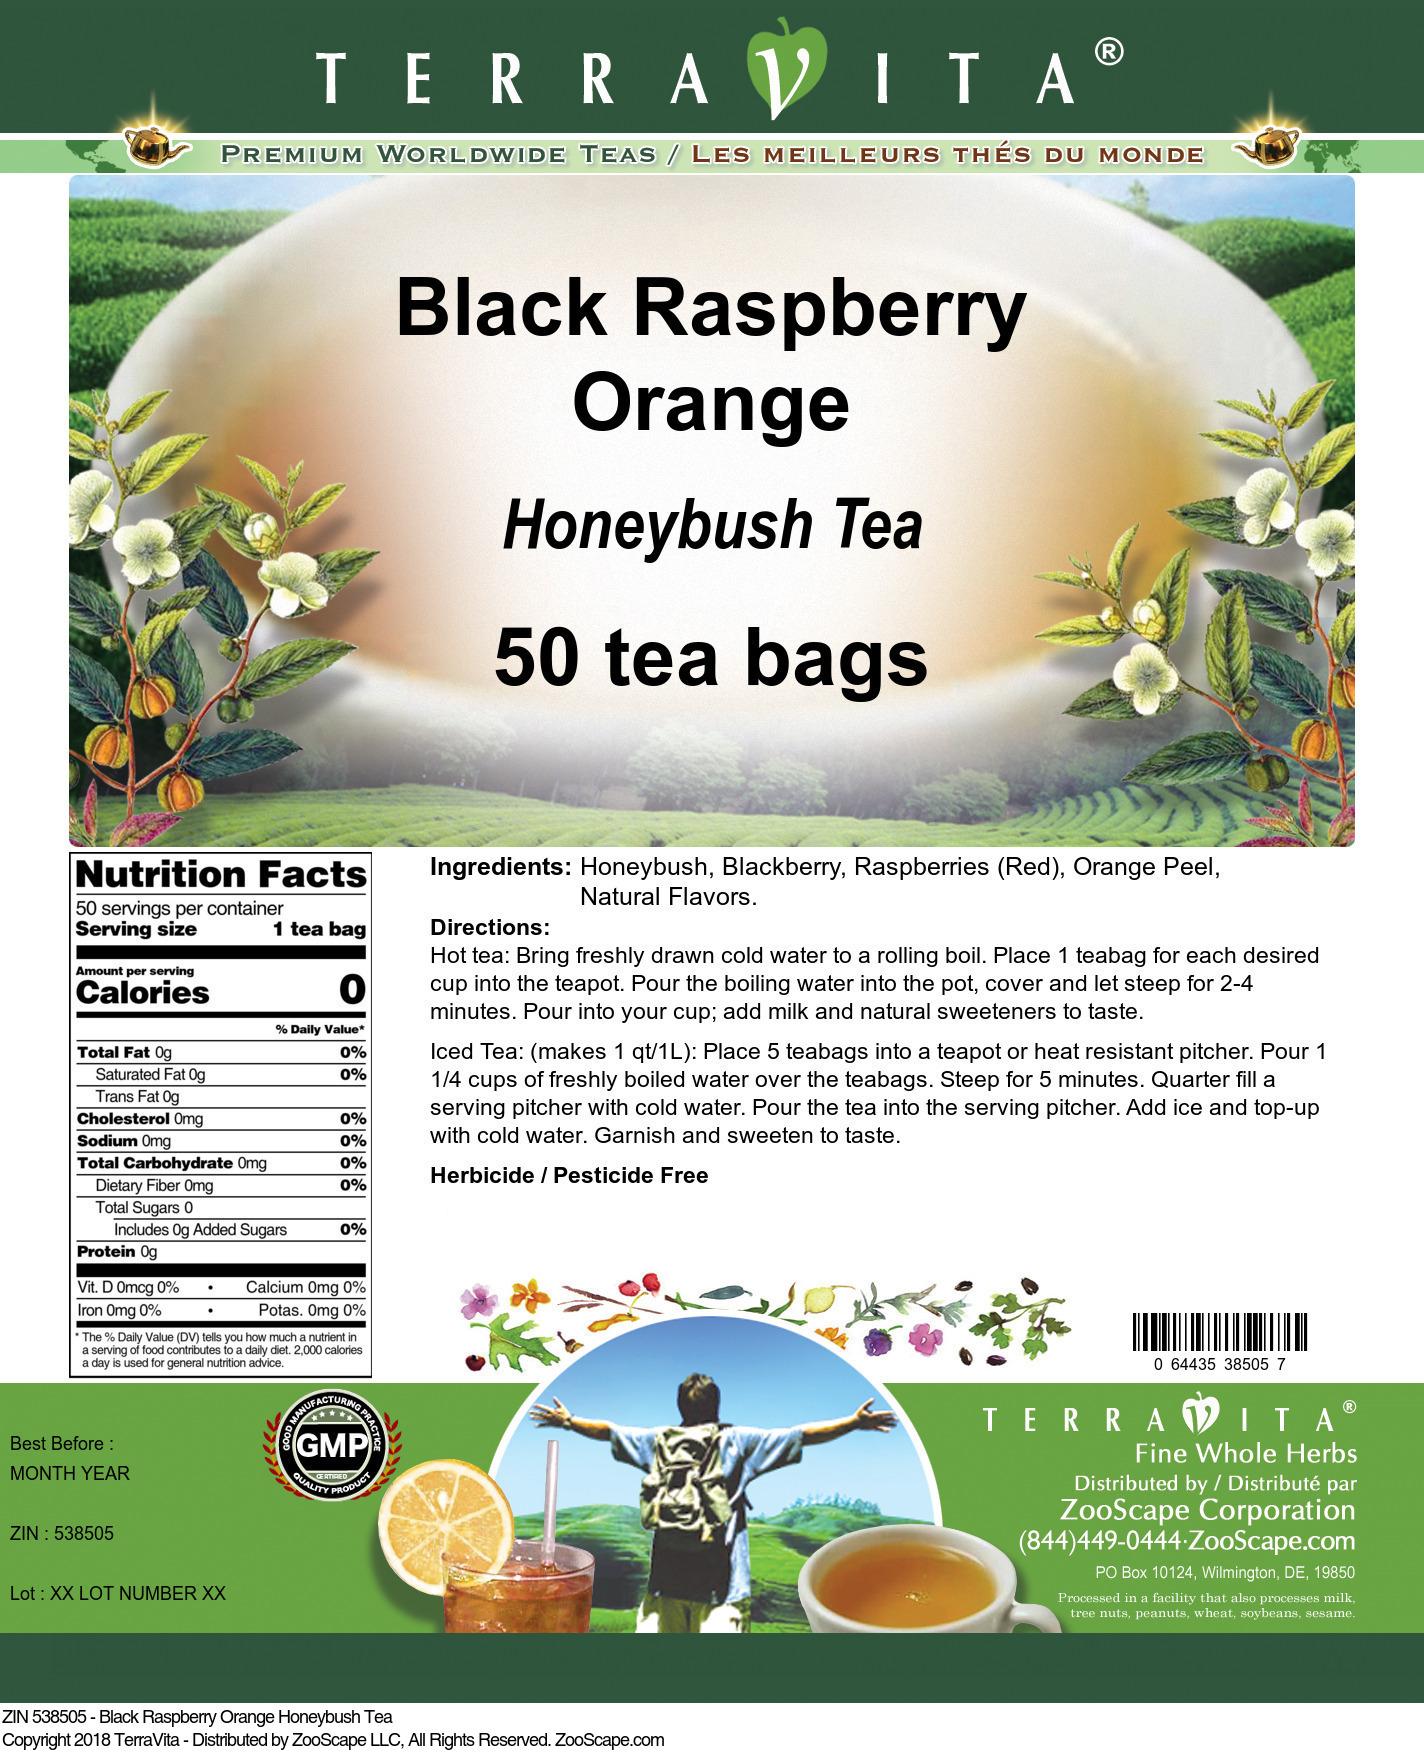 Black Raspberry Orange Honeybush Tea